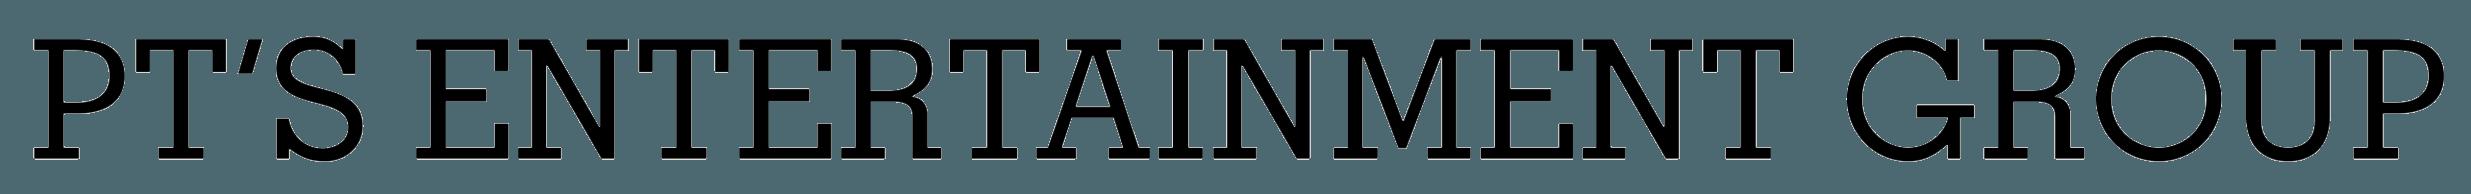 https://brandoutlook.com/wp-content/uploads/2019/06/PTs-Entertainment-Group-Logo.png